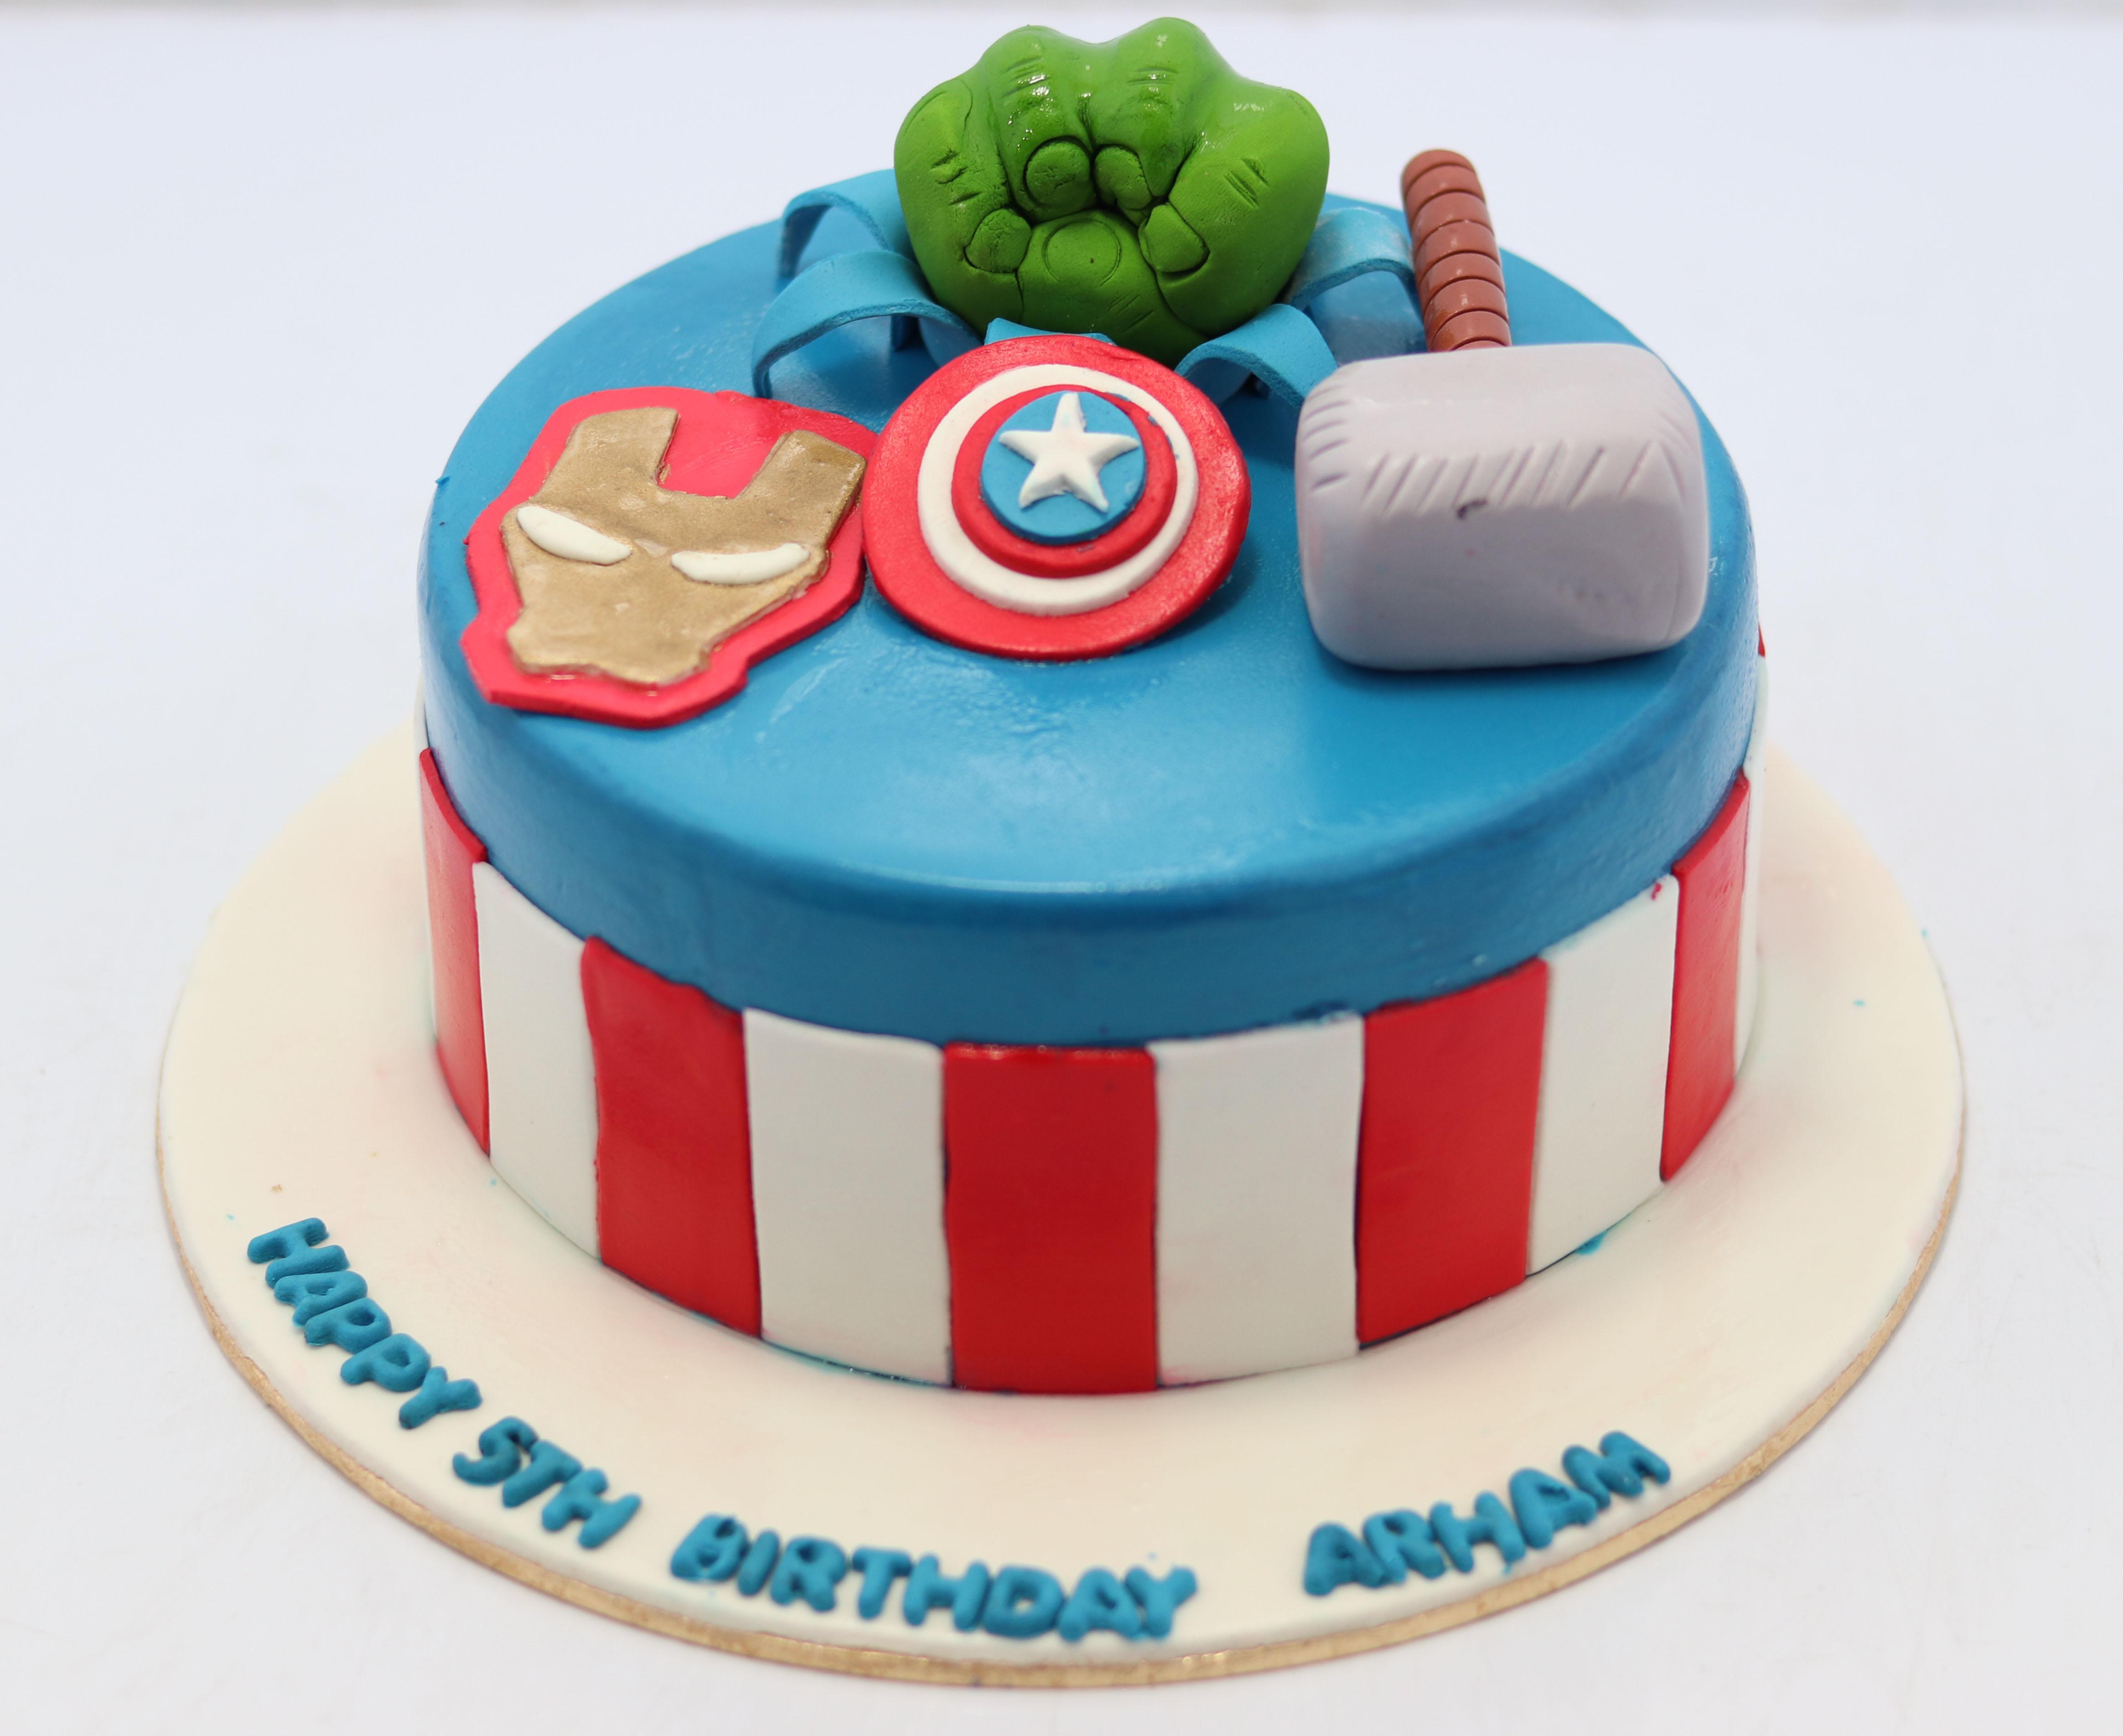 Sensational Super Hero Birthday Cake Superhero Cakes Images Personalised Birthday Cards Epsylily Jamesorg